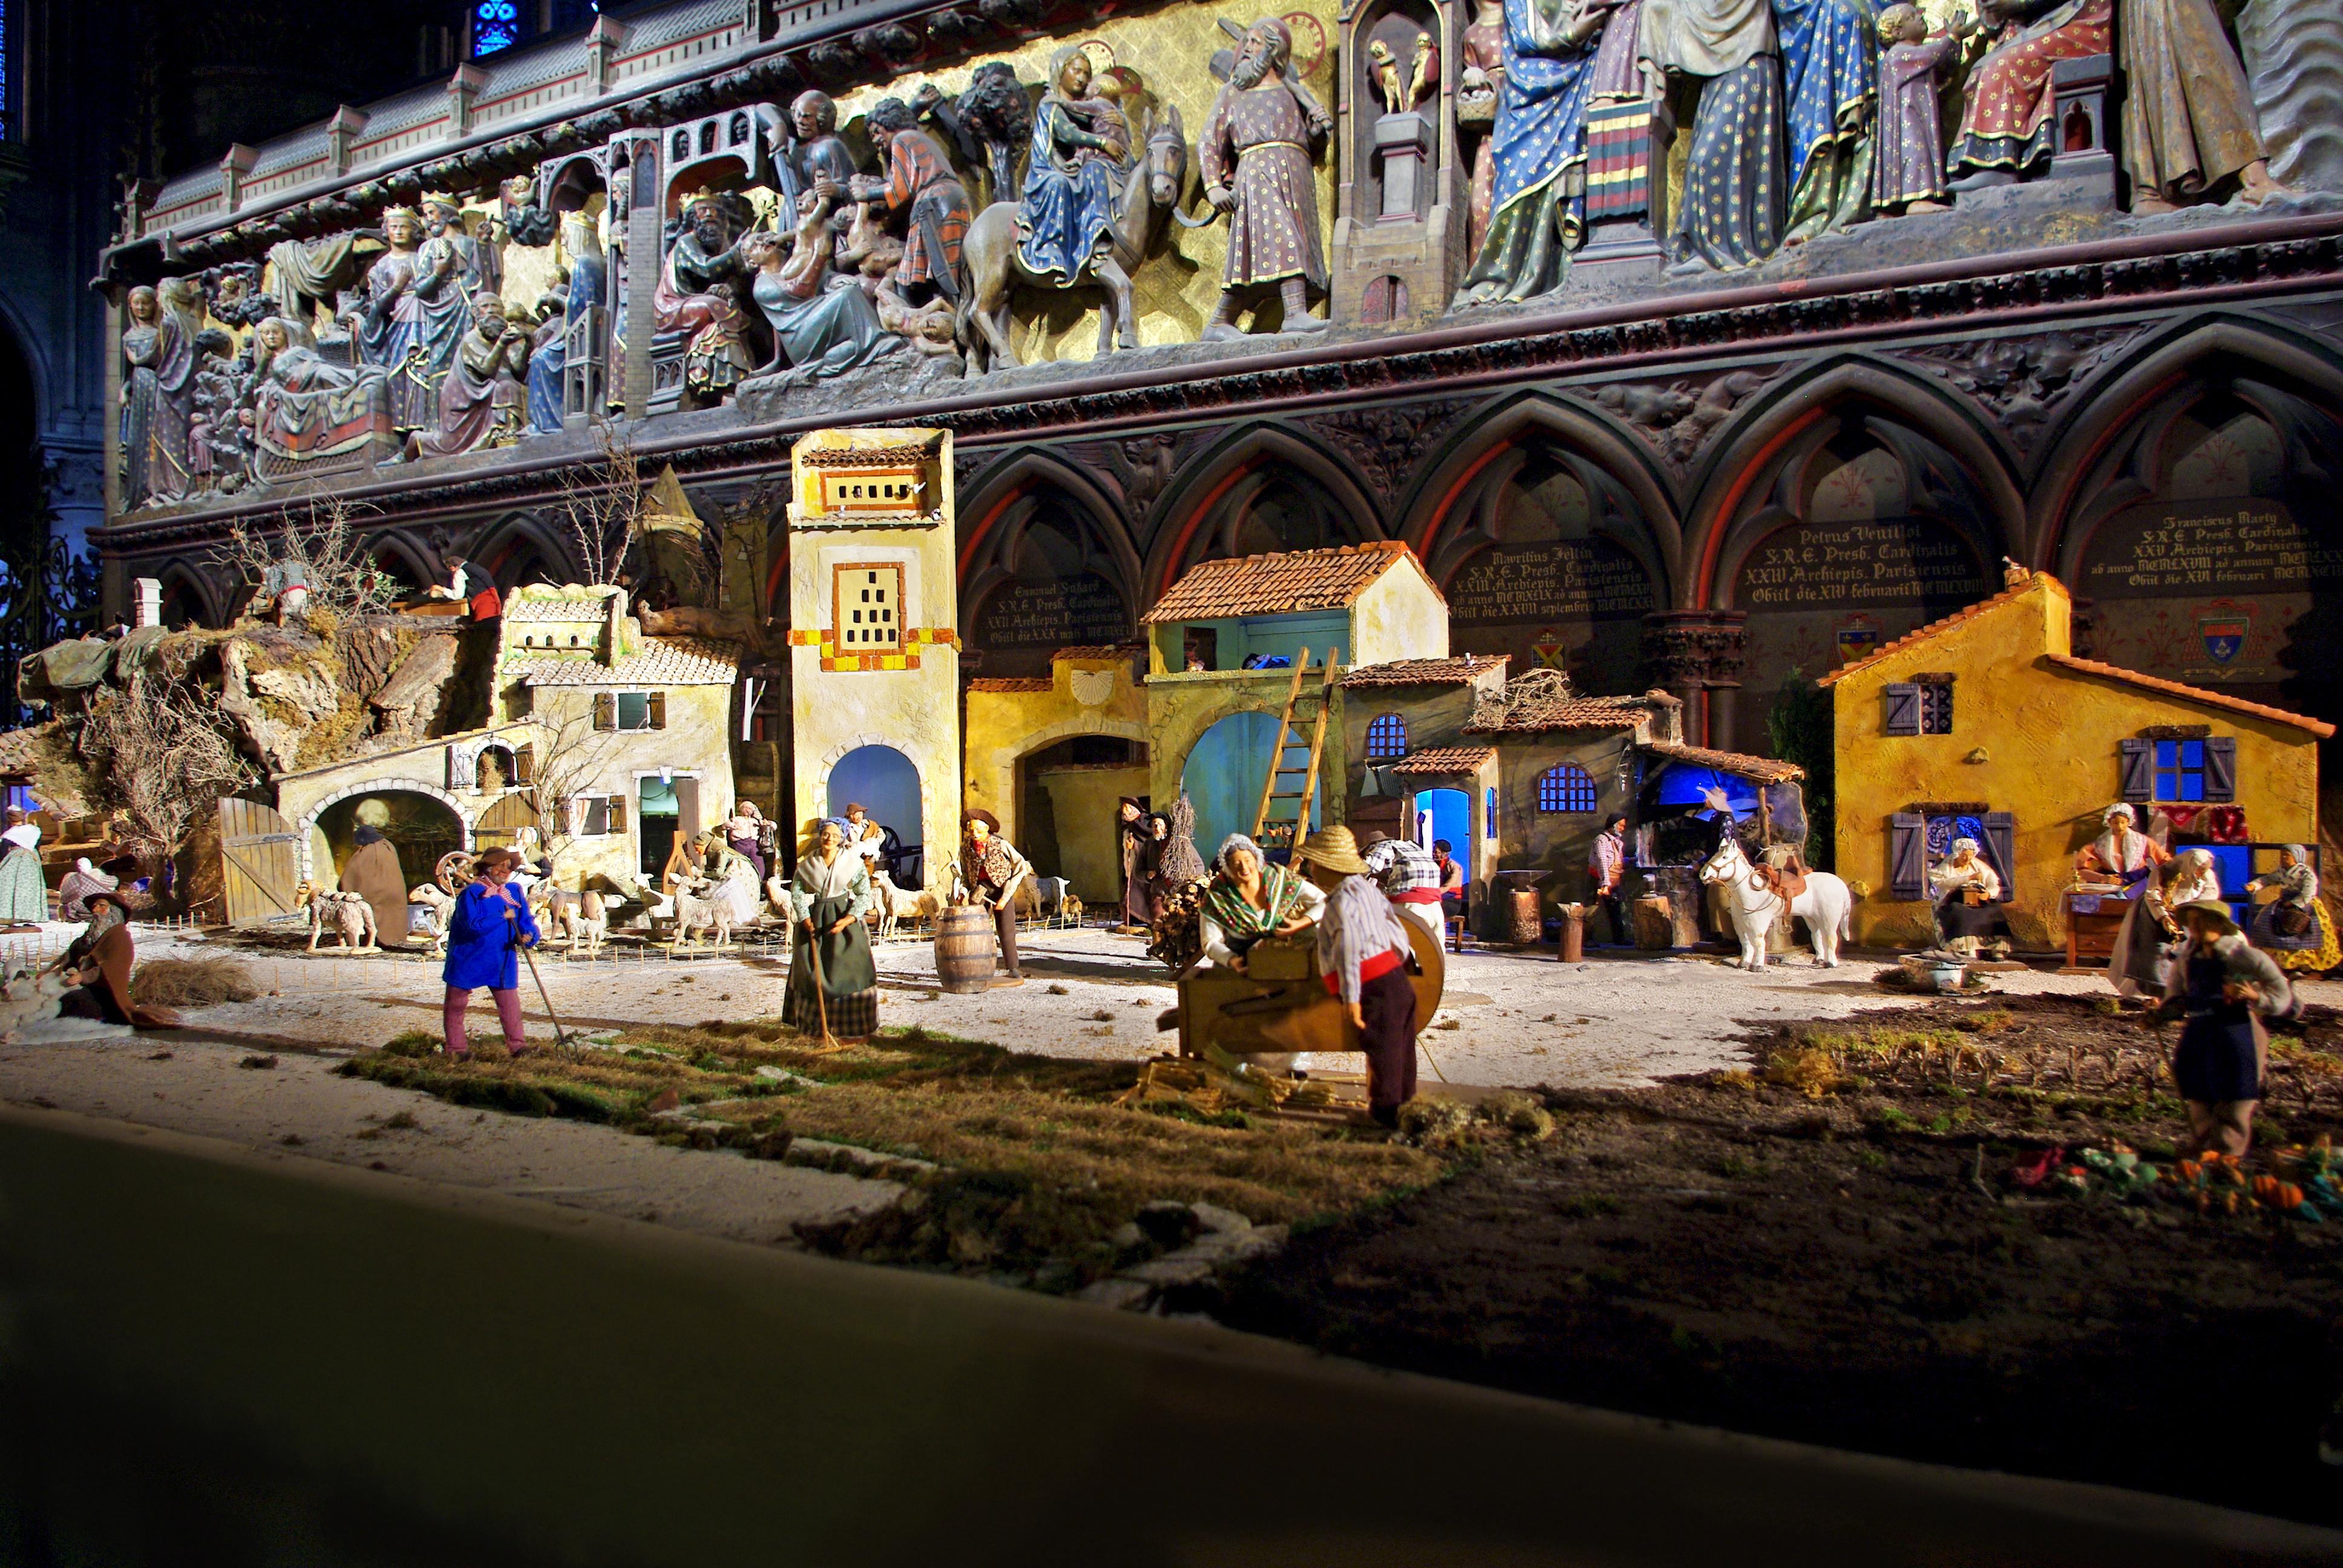 Nativity scene at Notre-Dame Paris 2016 2017